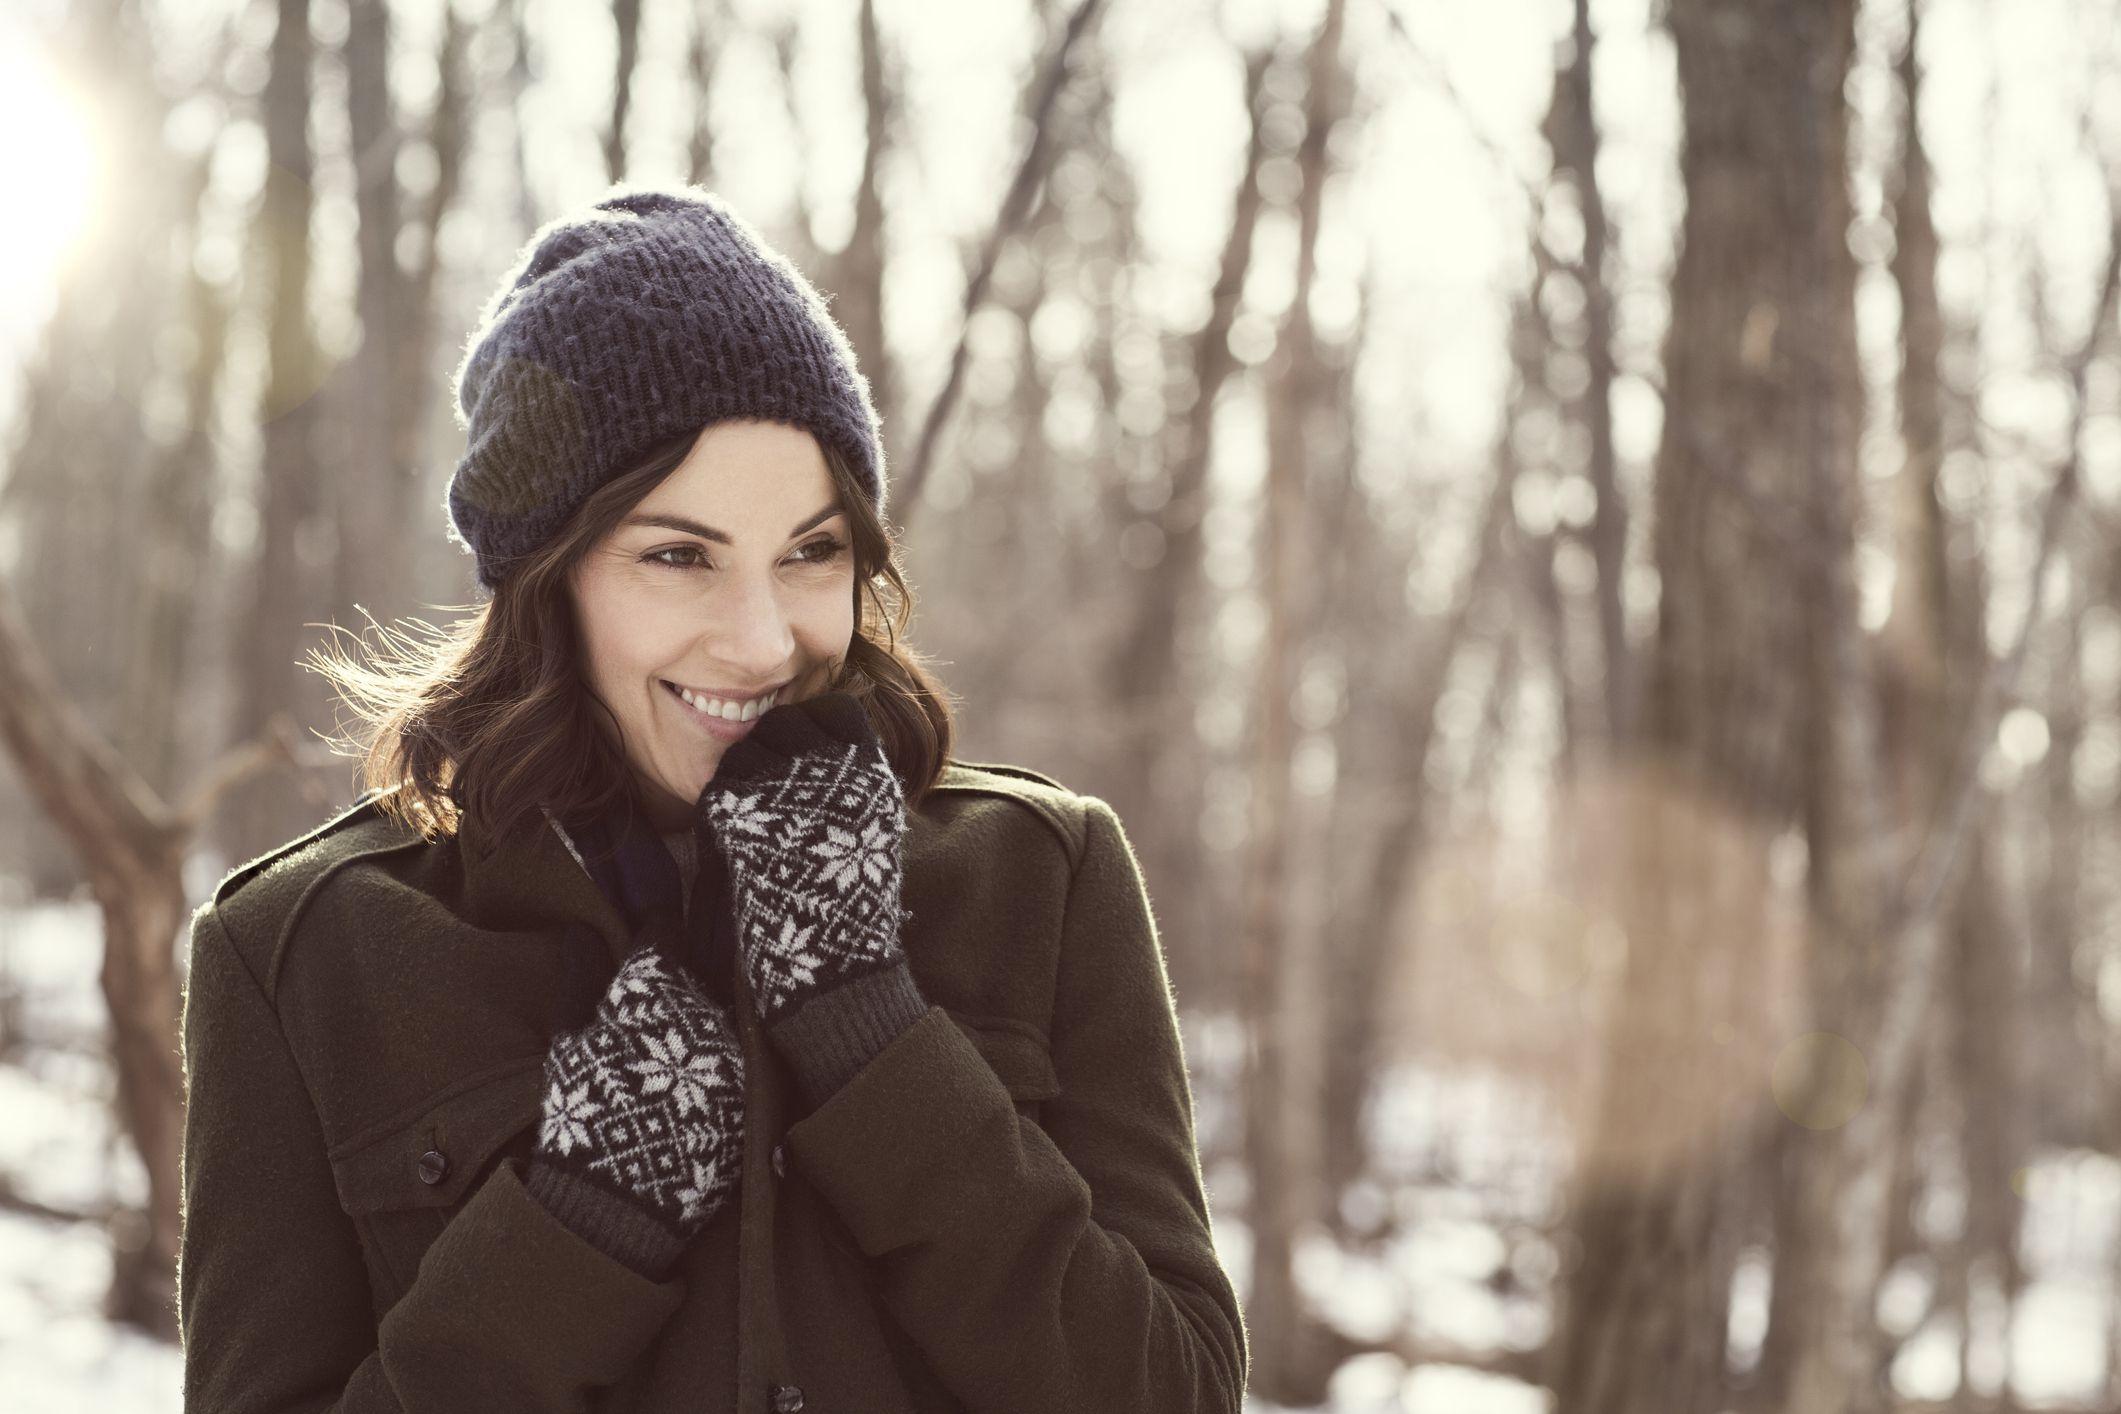 The 12 Best Winter Gloves for Women of 2020